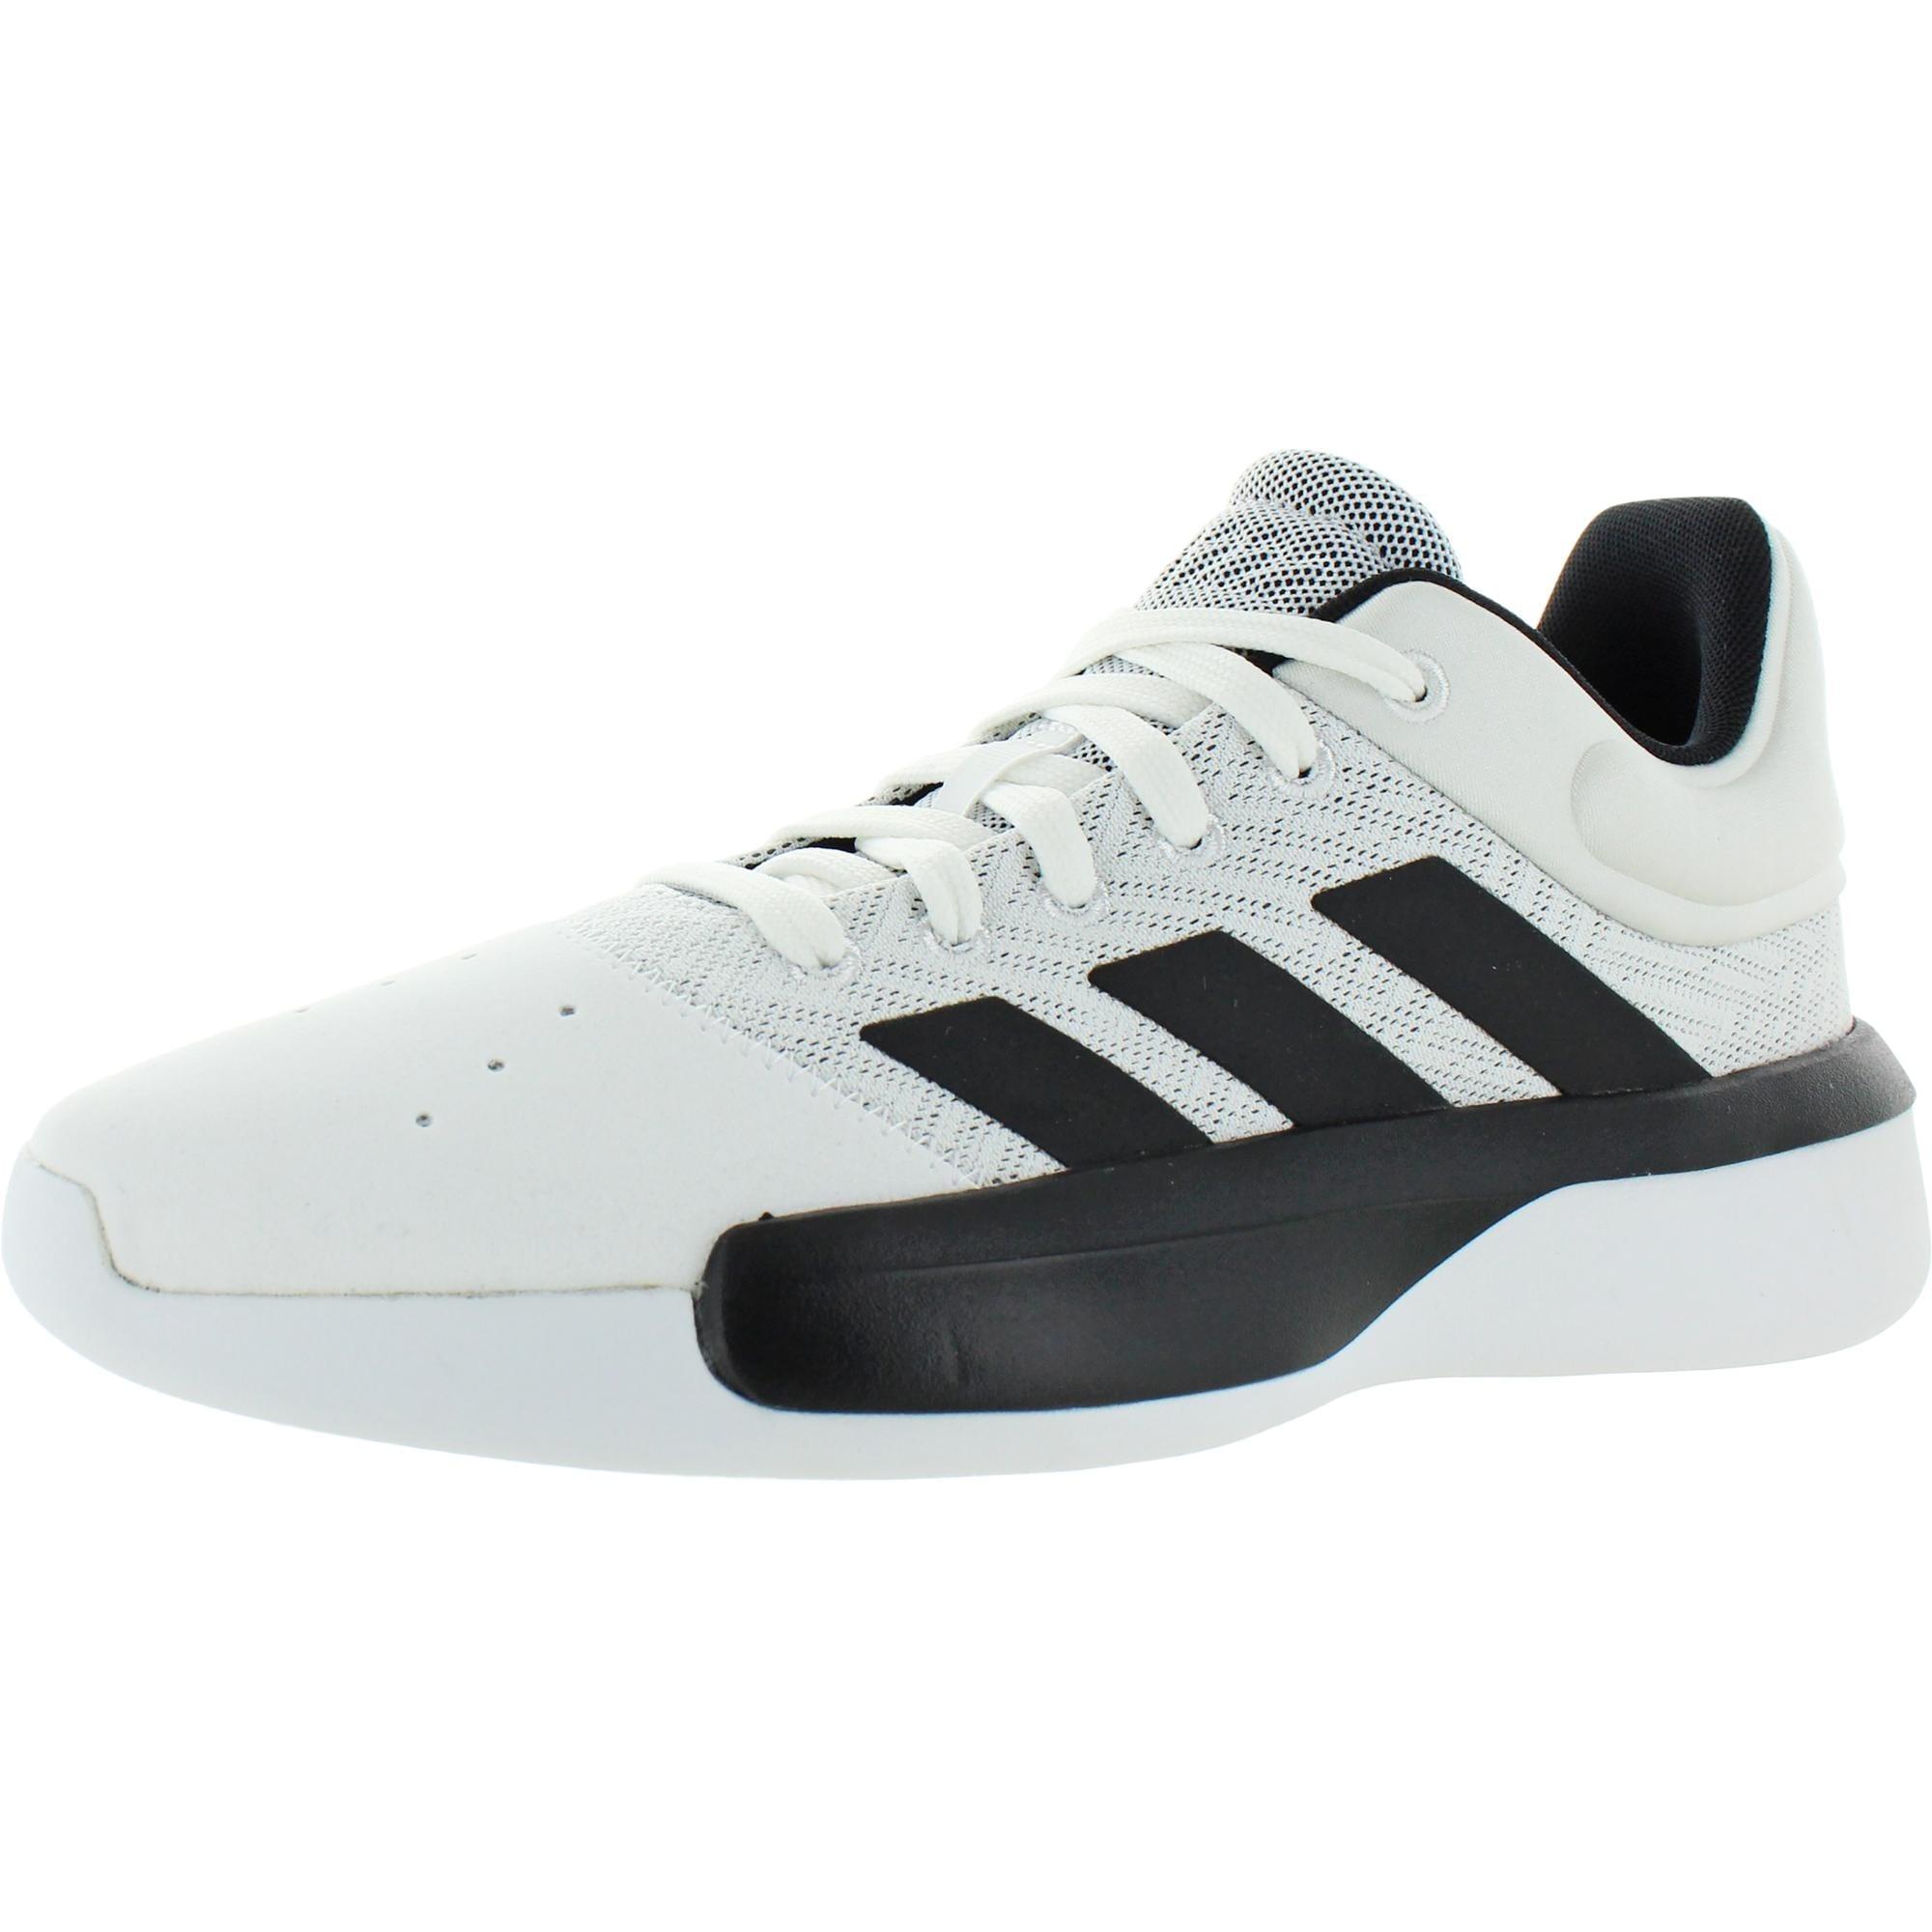 White/Core Black/Grey Four - Overstock